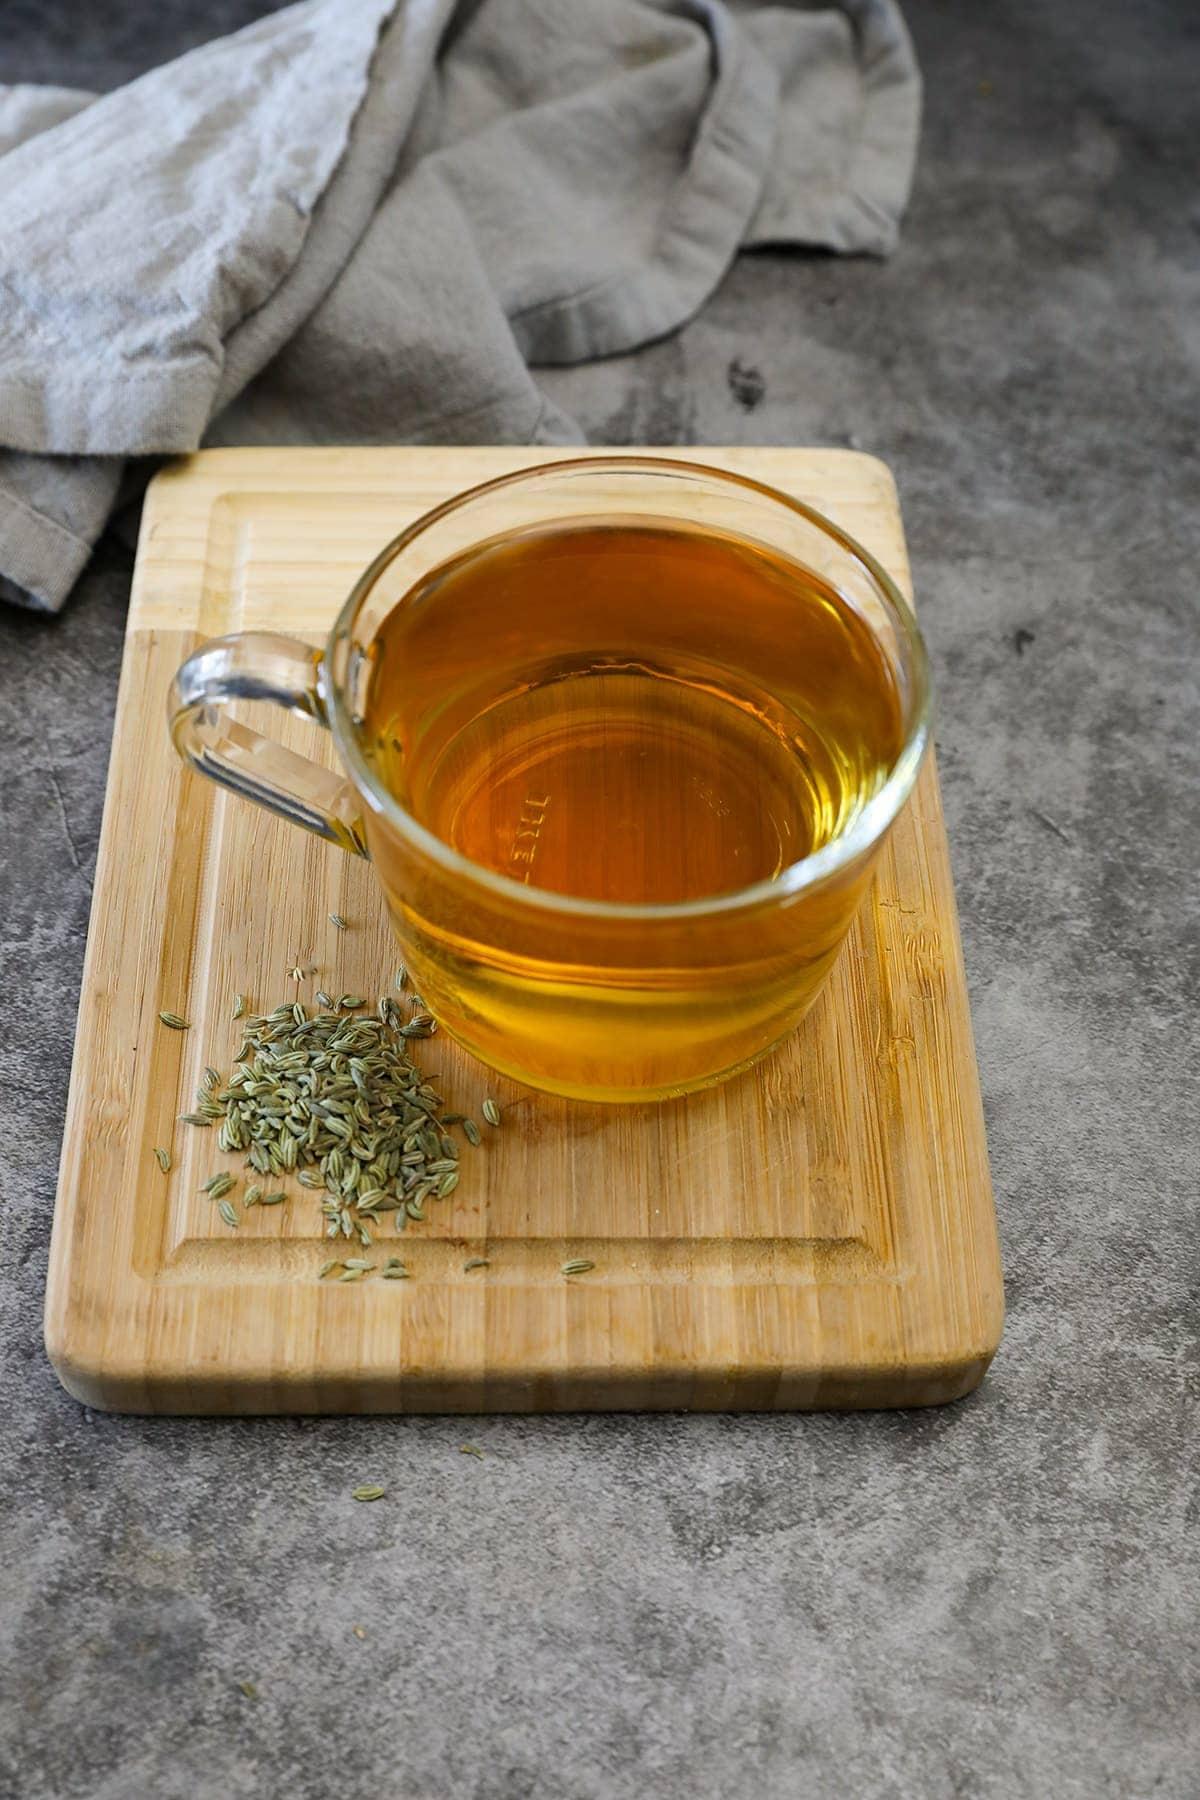 fennel seed tea on a wooden cutting board